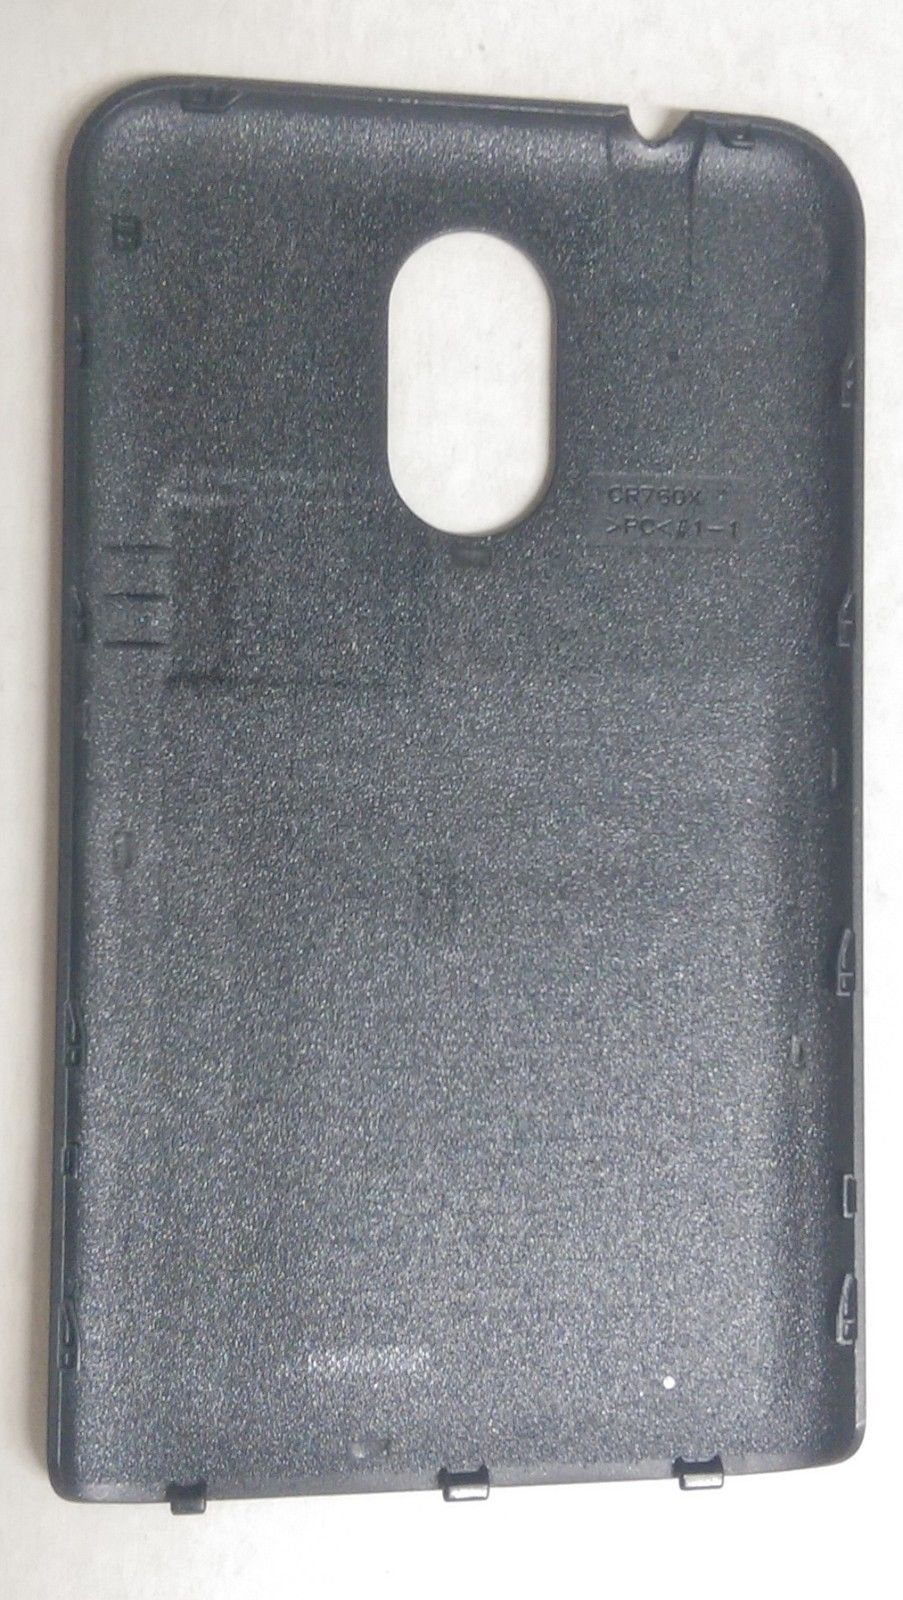 OEM Samsung Galaxy S2 S II 2 R760 Back Cover Battery Door - Gray / Black